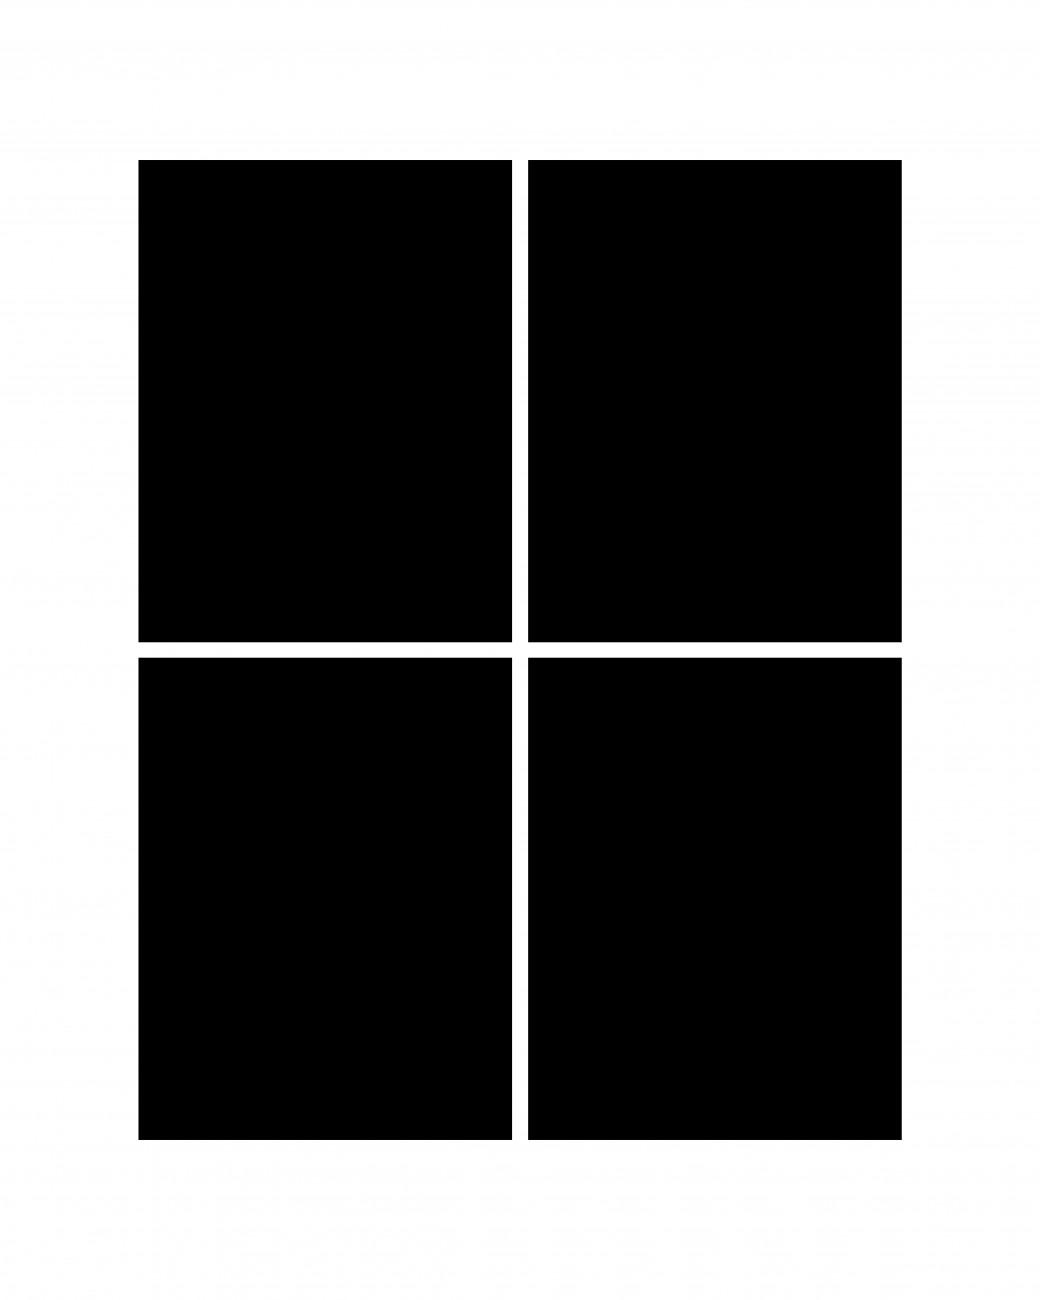 40x50 cm 04 - 4 bilder